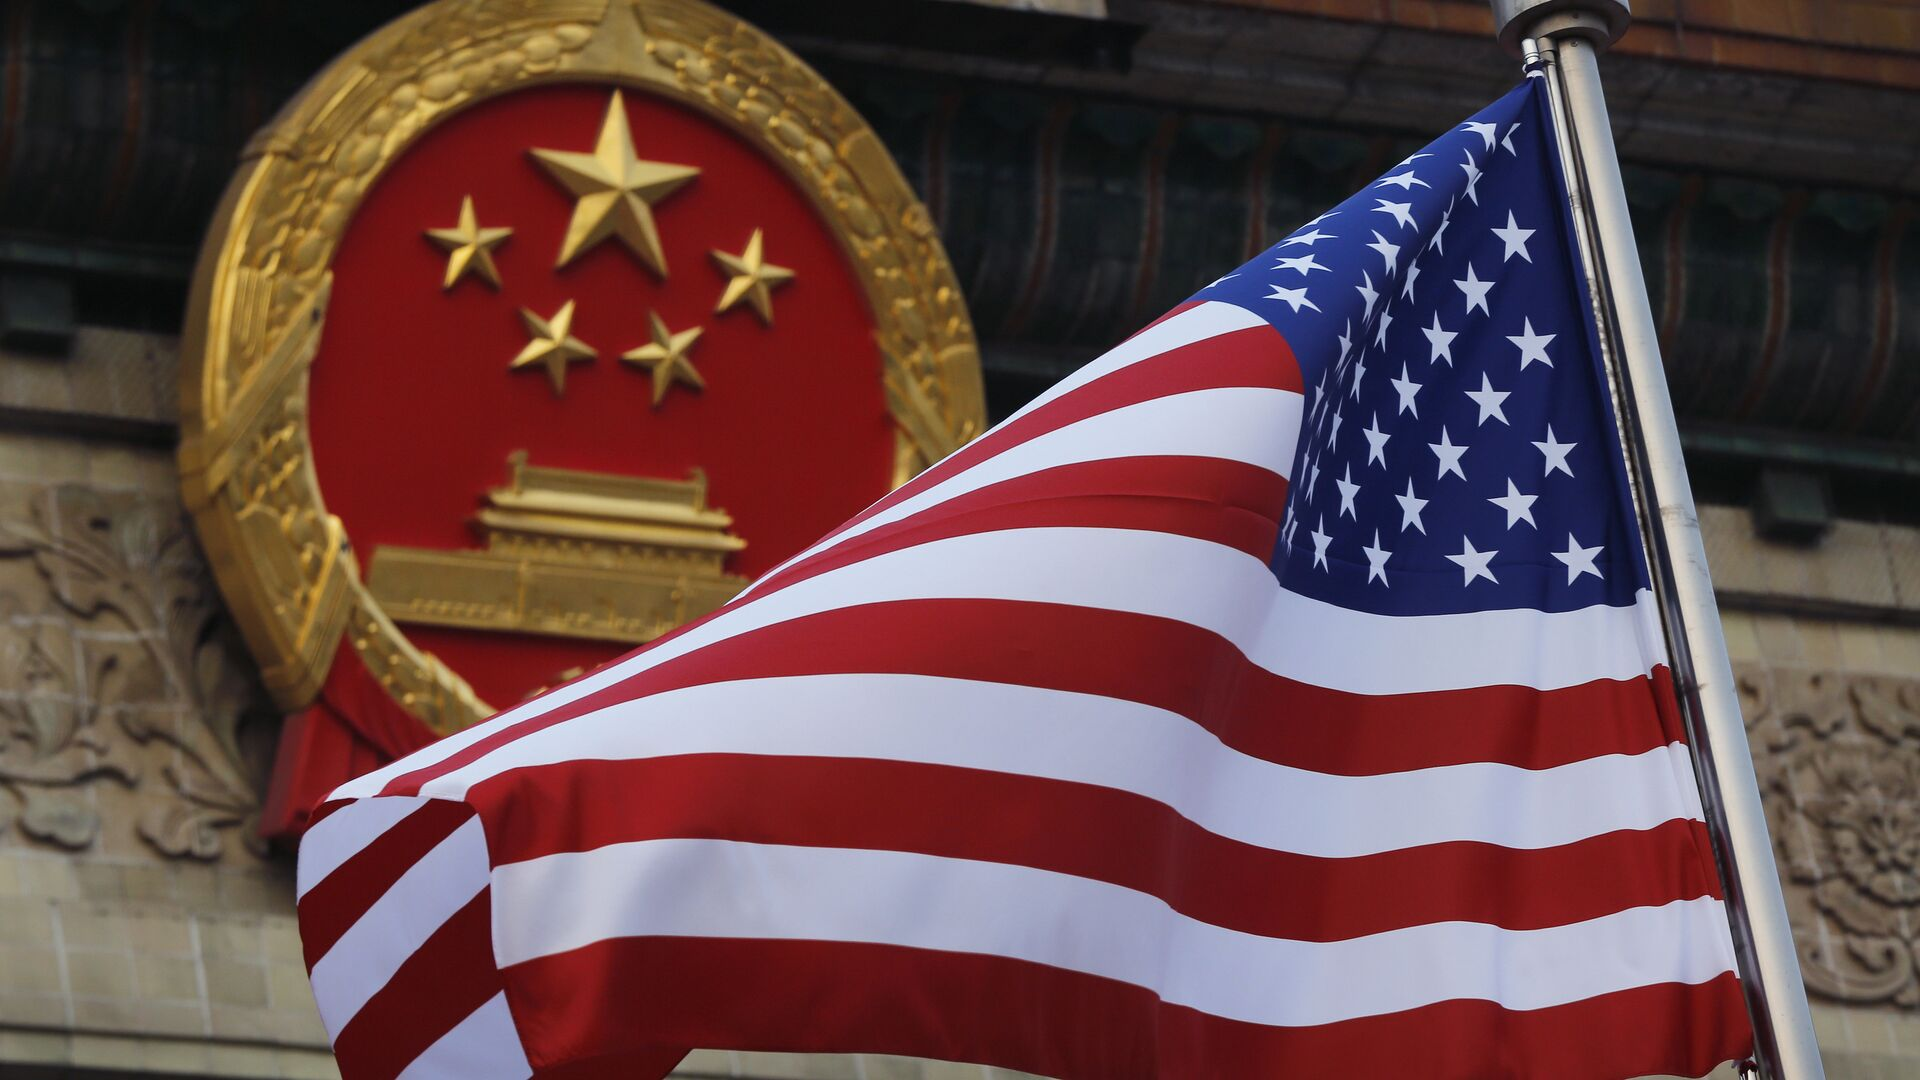 La bandera de EEUU y el emblema de China  - Sputnik Mundo, 1920, 02.02.2021